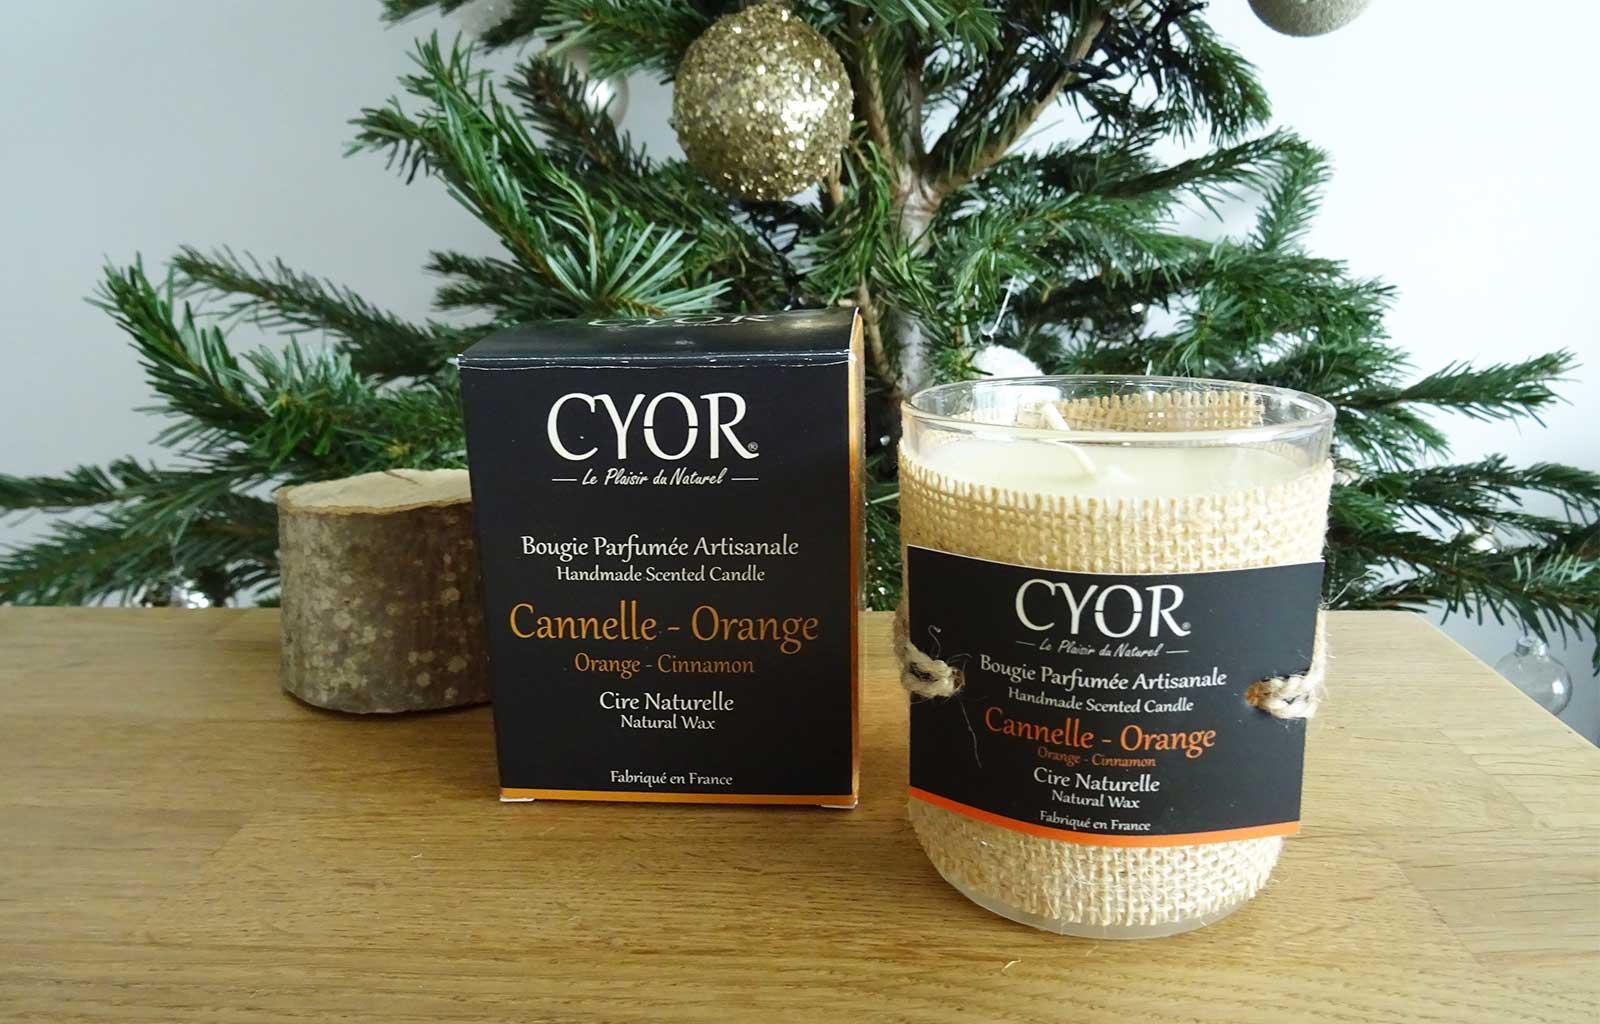 bougie naturelle artisanale cyor cannelle orange